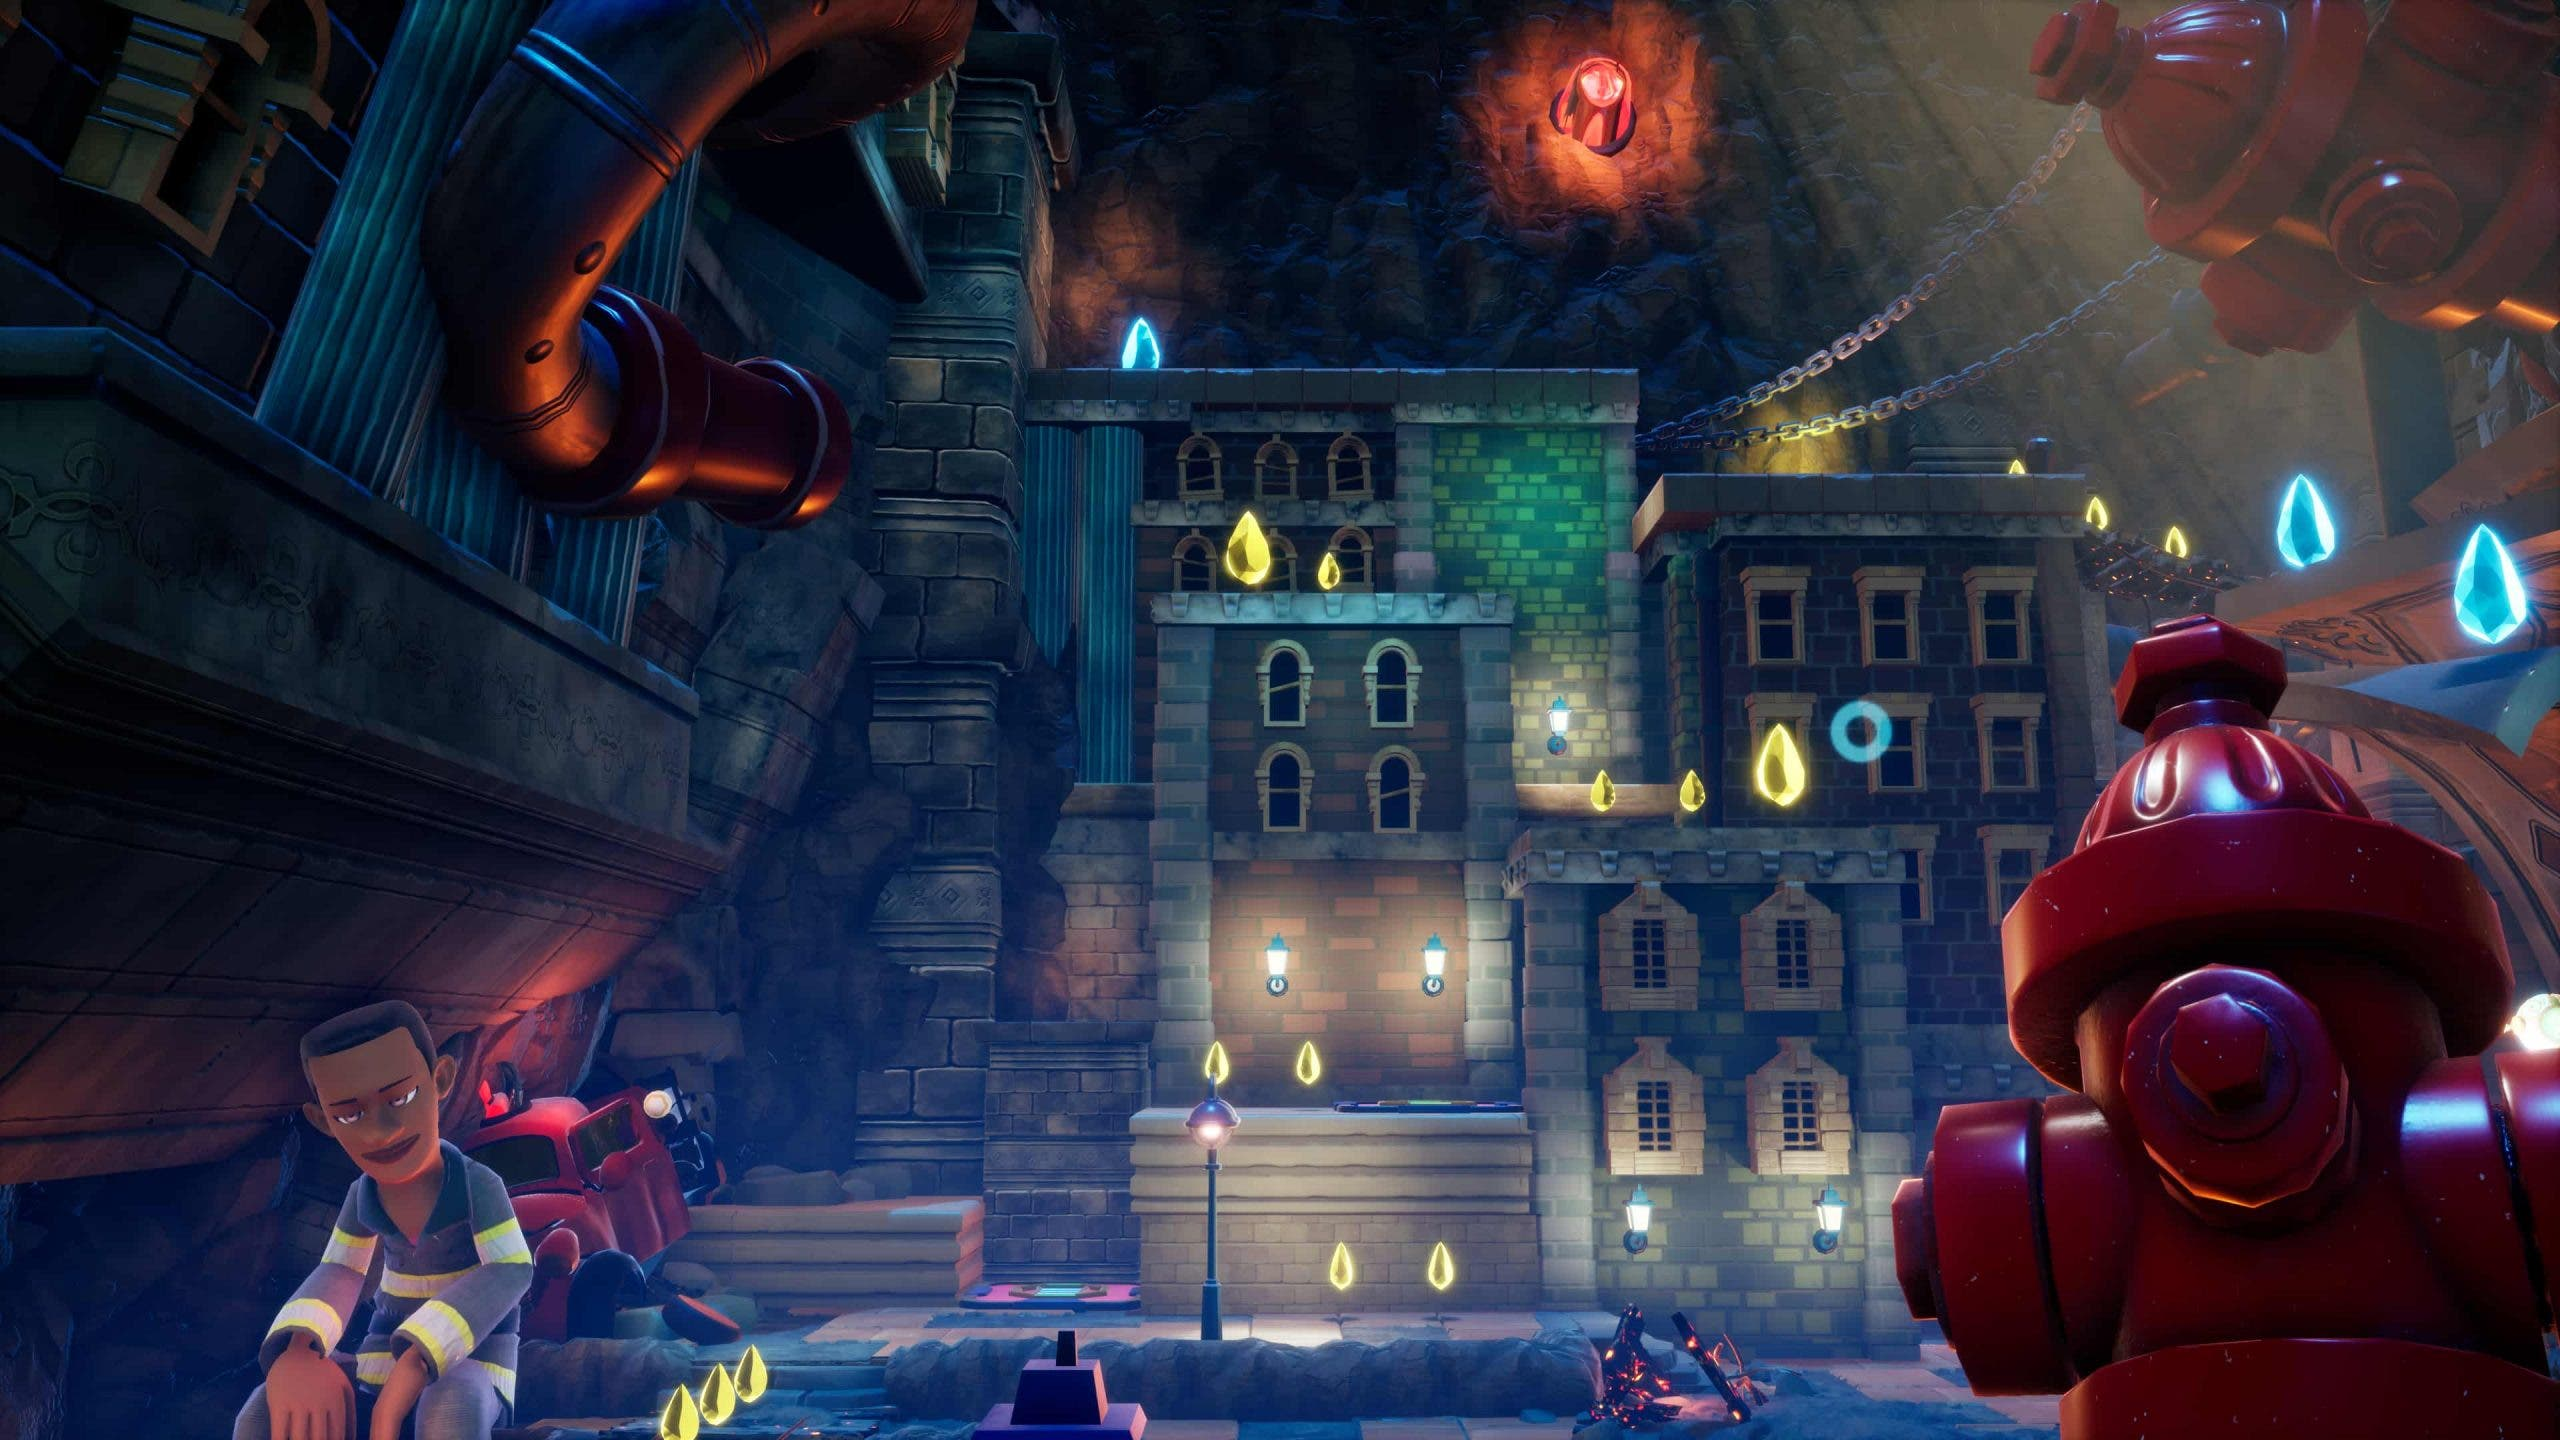 Análisis de Balan Wonderworld - Xbox Series X 4